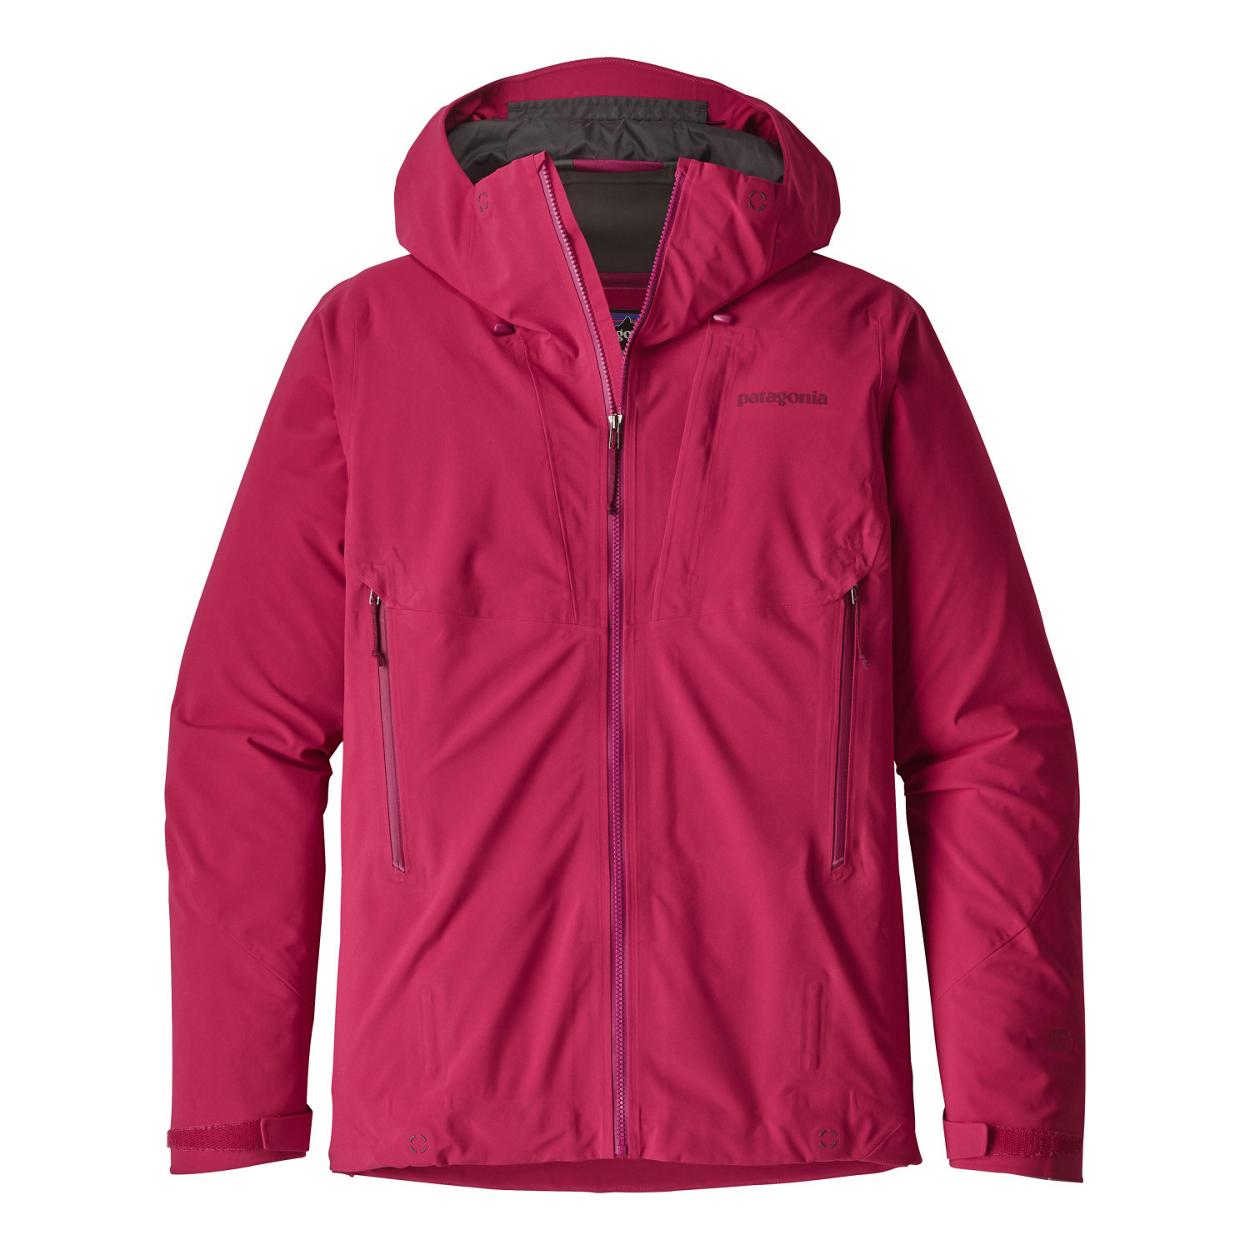 Galvanized Jacket Wms